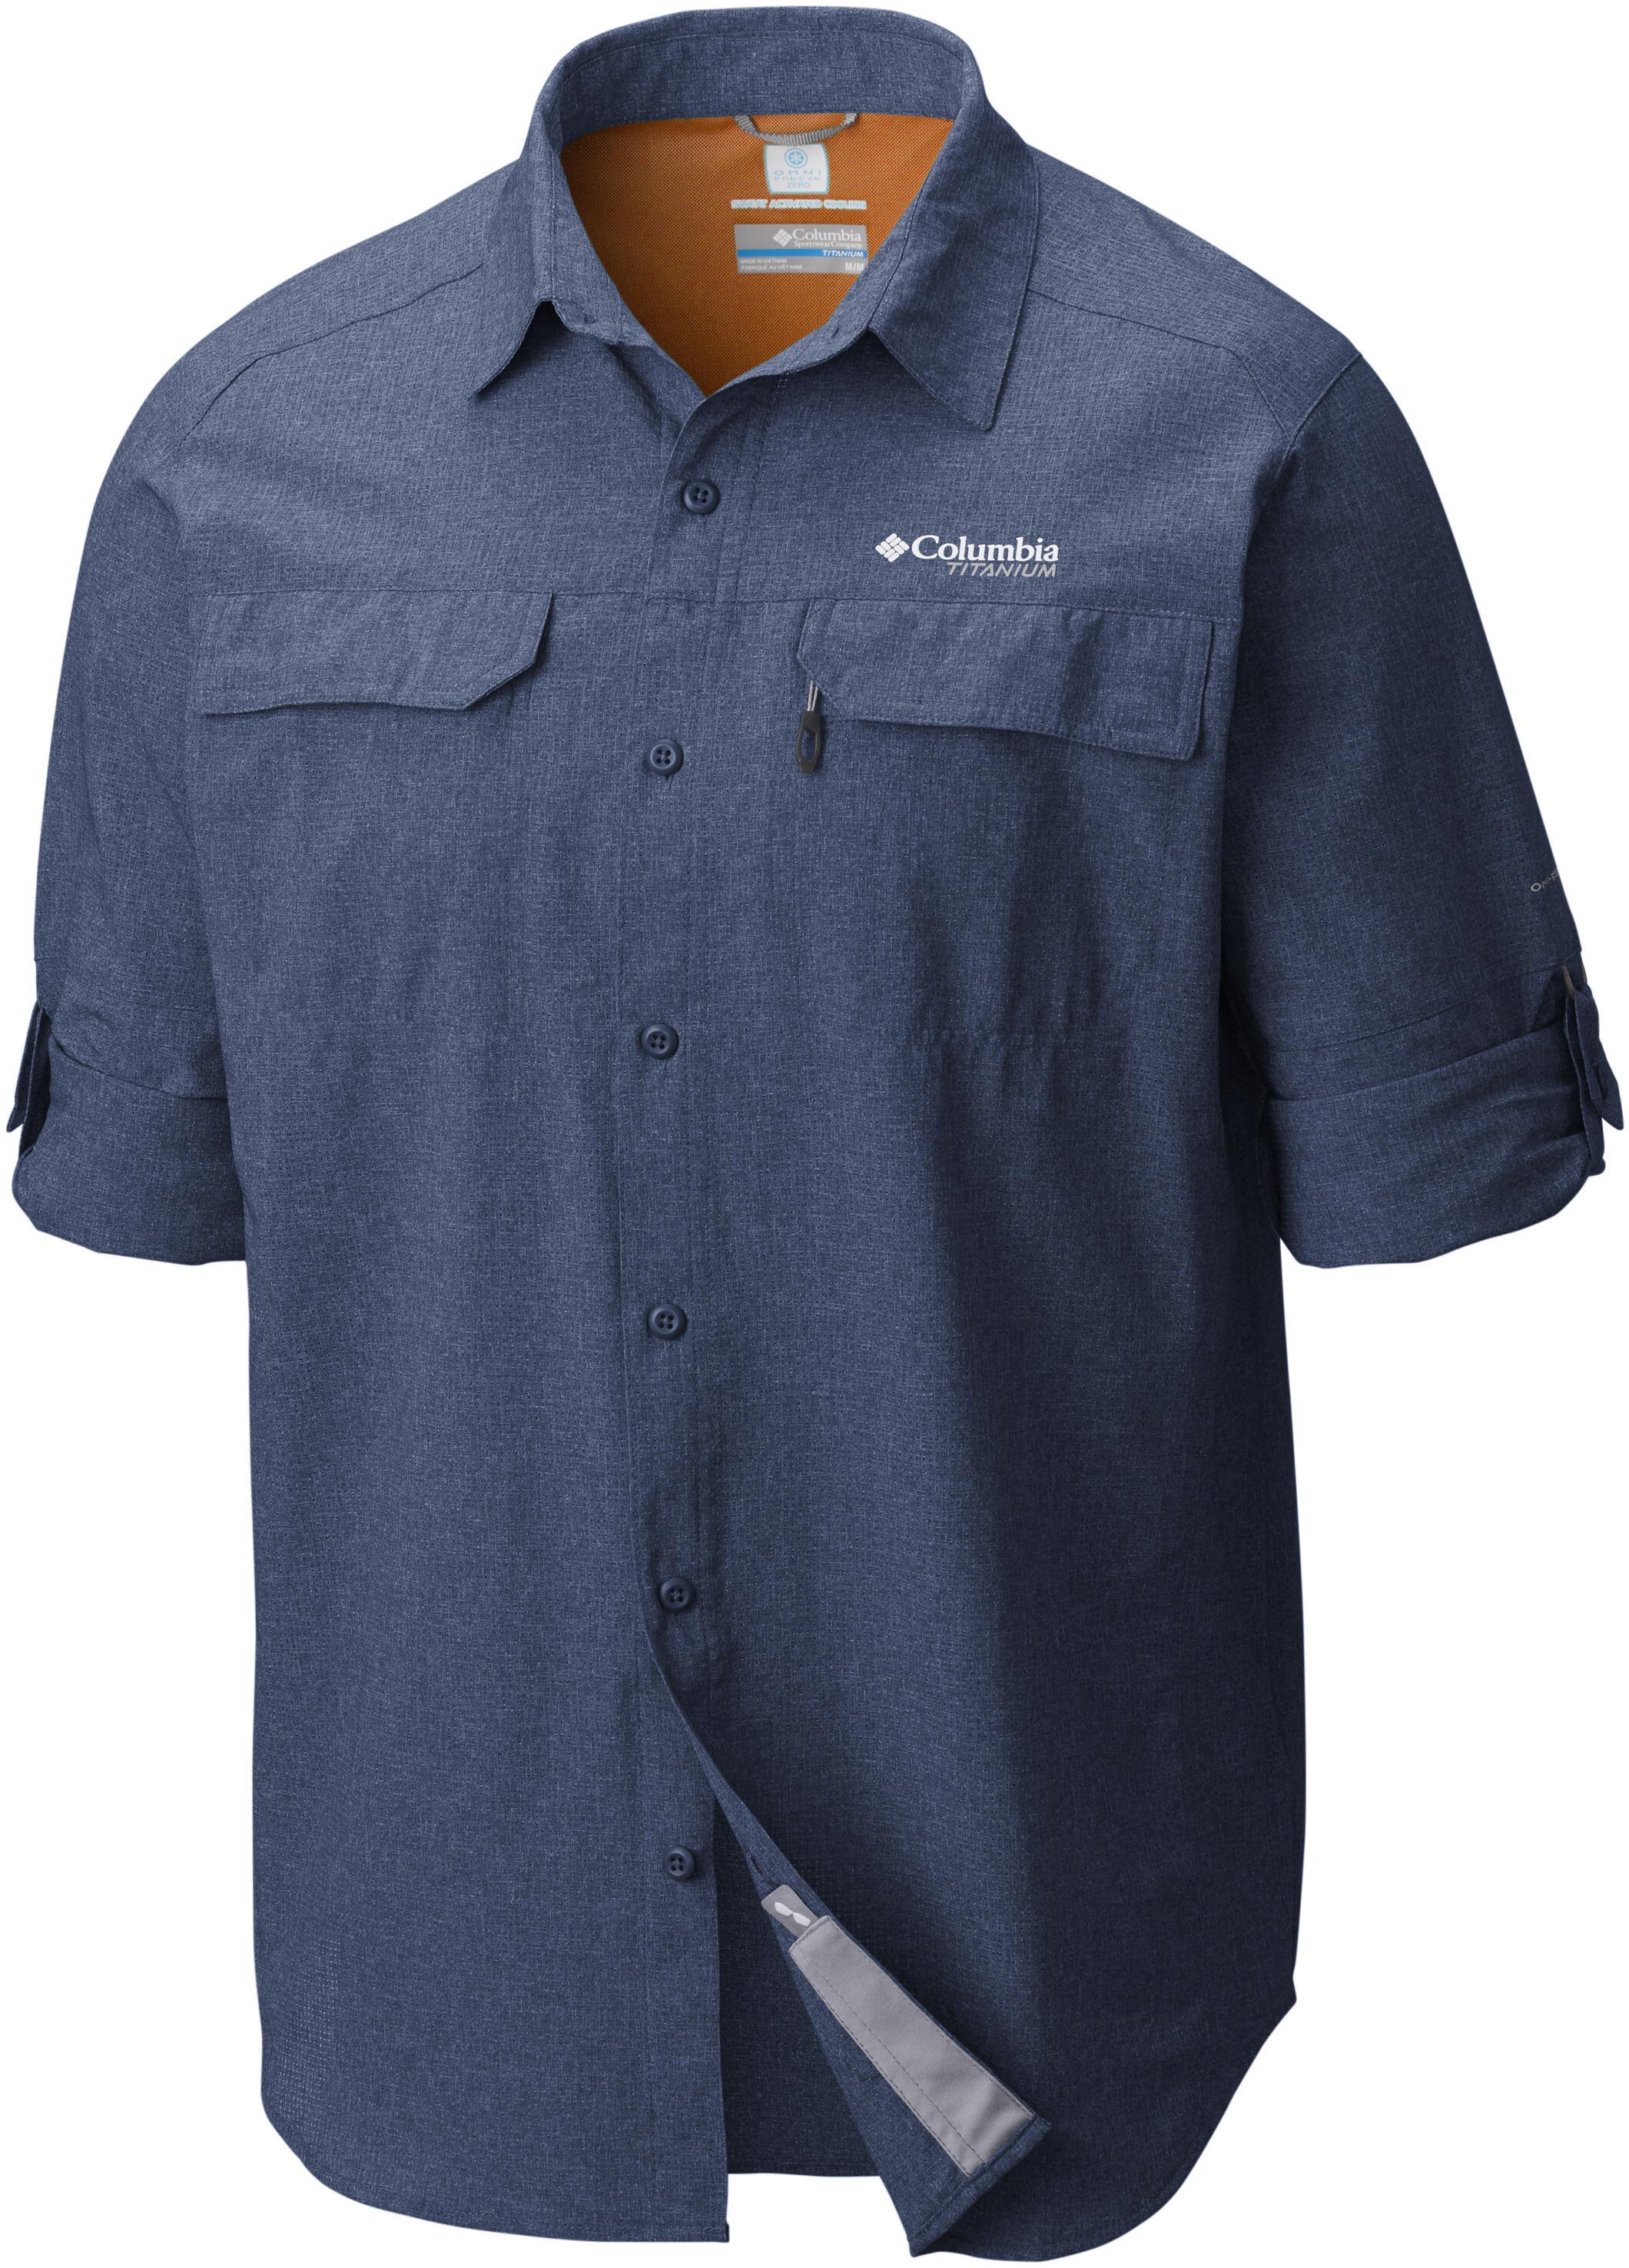 05249664829 Columbia Irico Longsleeve Shirt Men blue at Addnature.co.uk